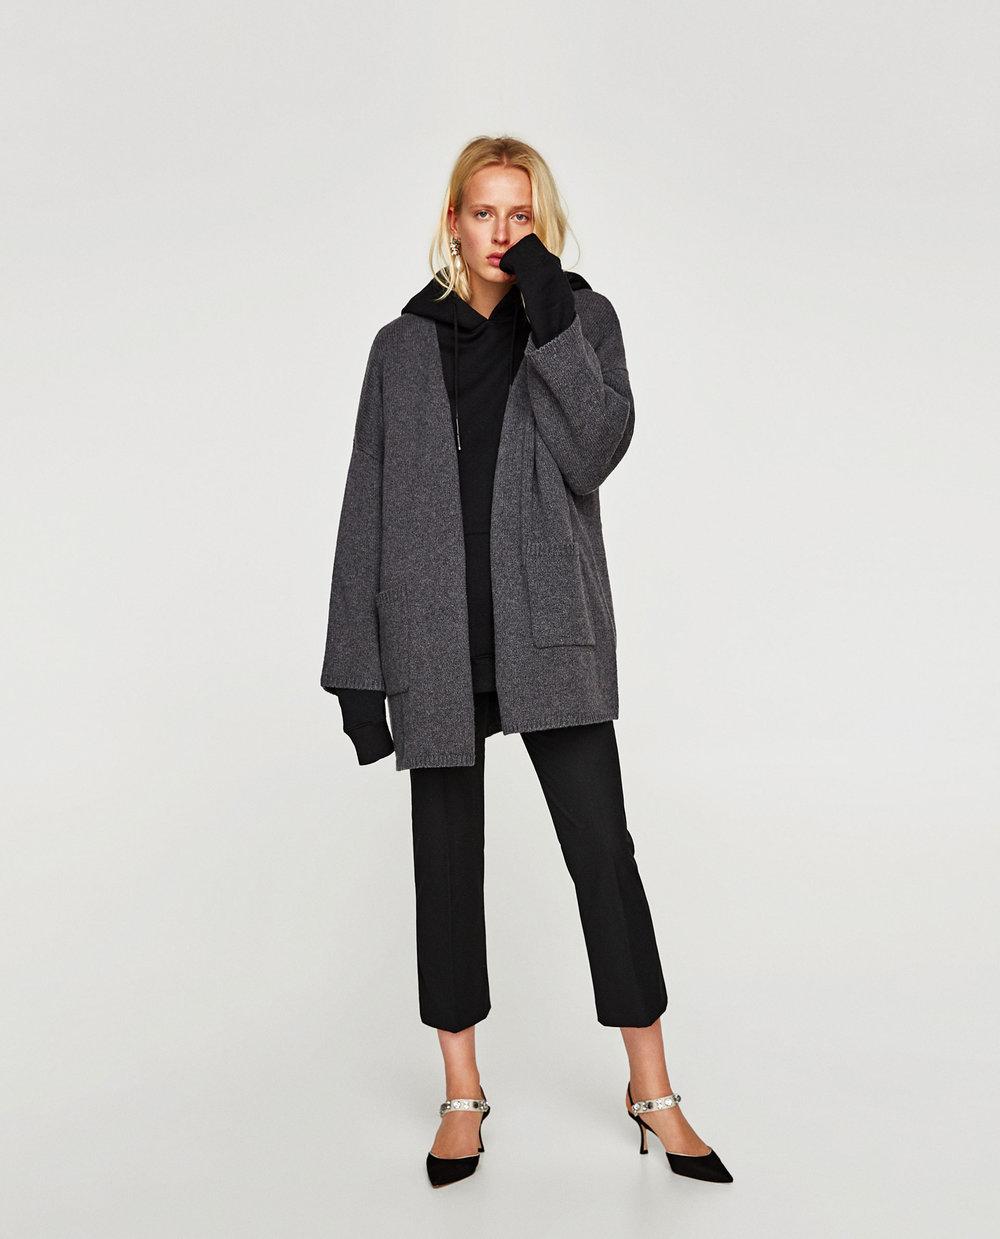 Zara Oversized Jacket With Pockets